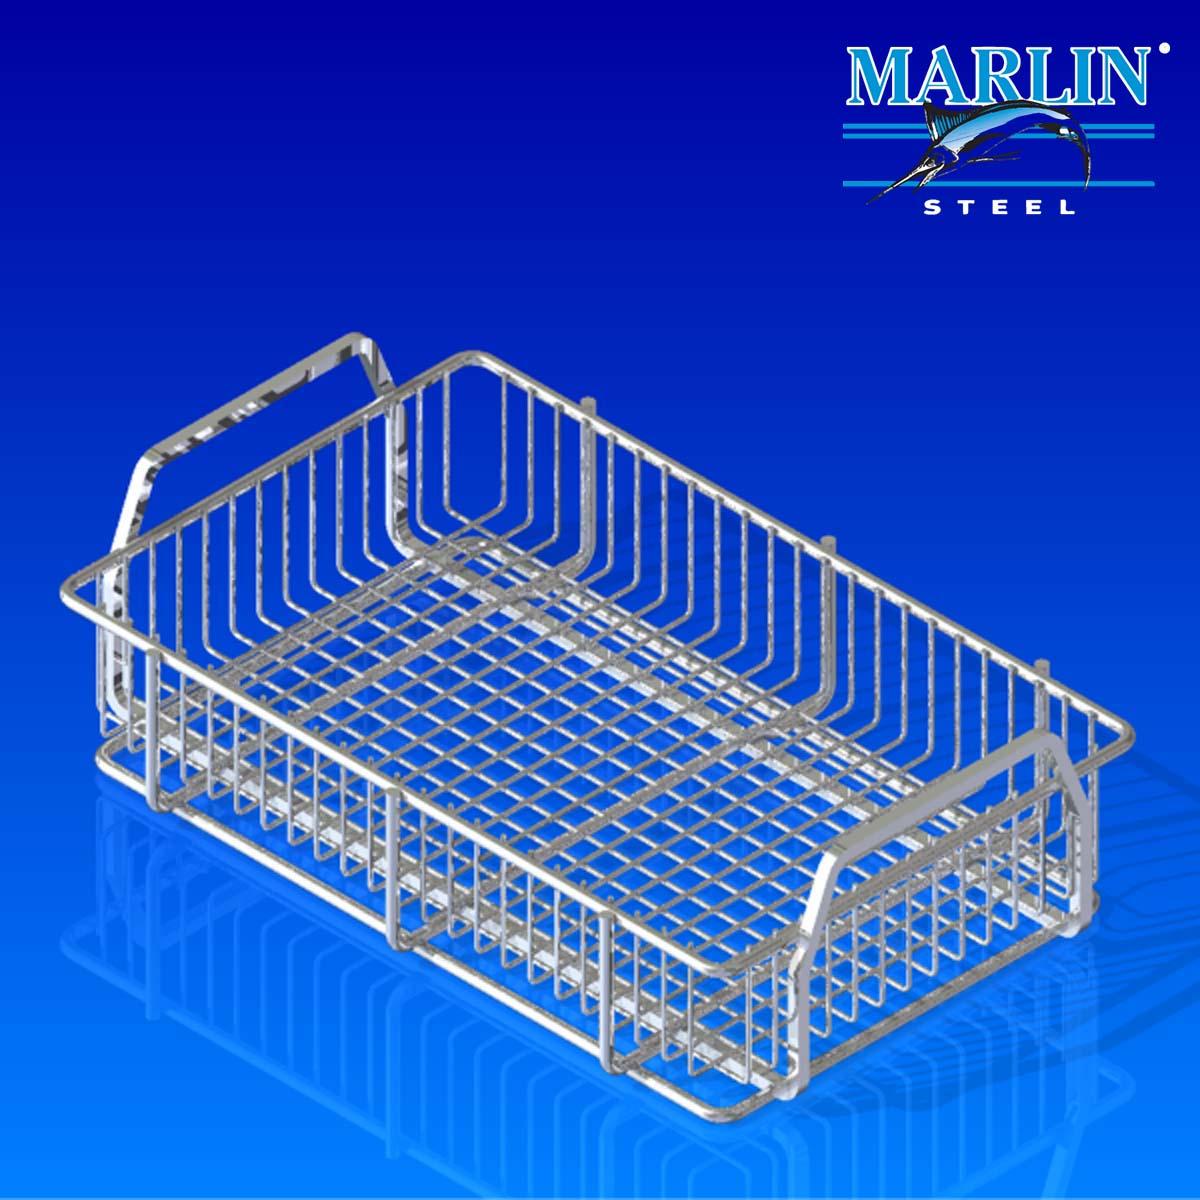 Marlin Steel Basket with Handles 286001